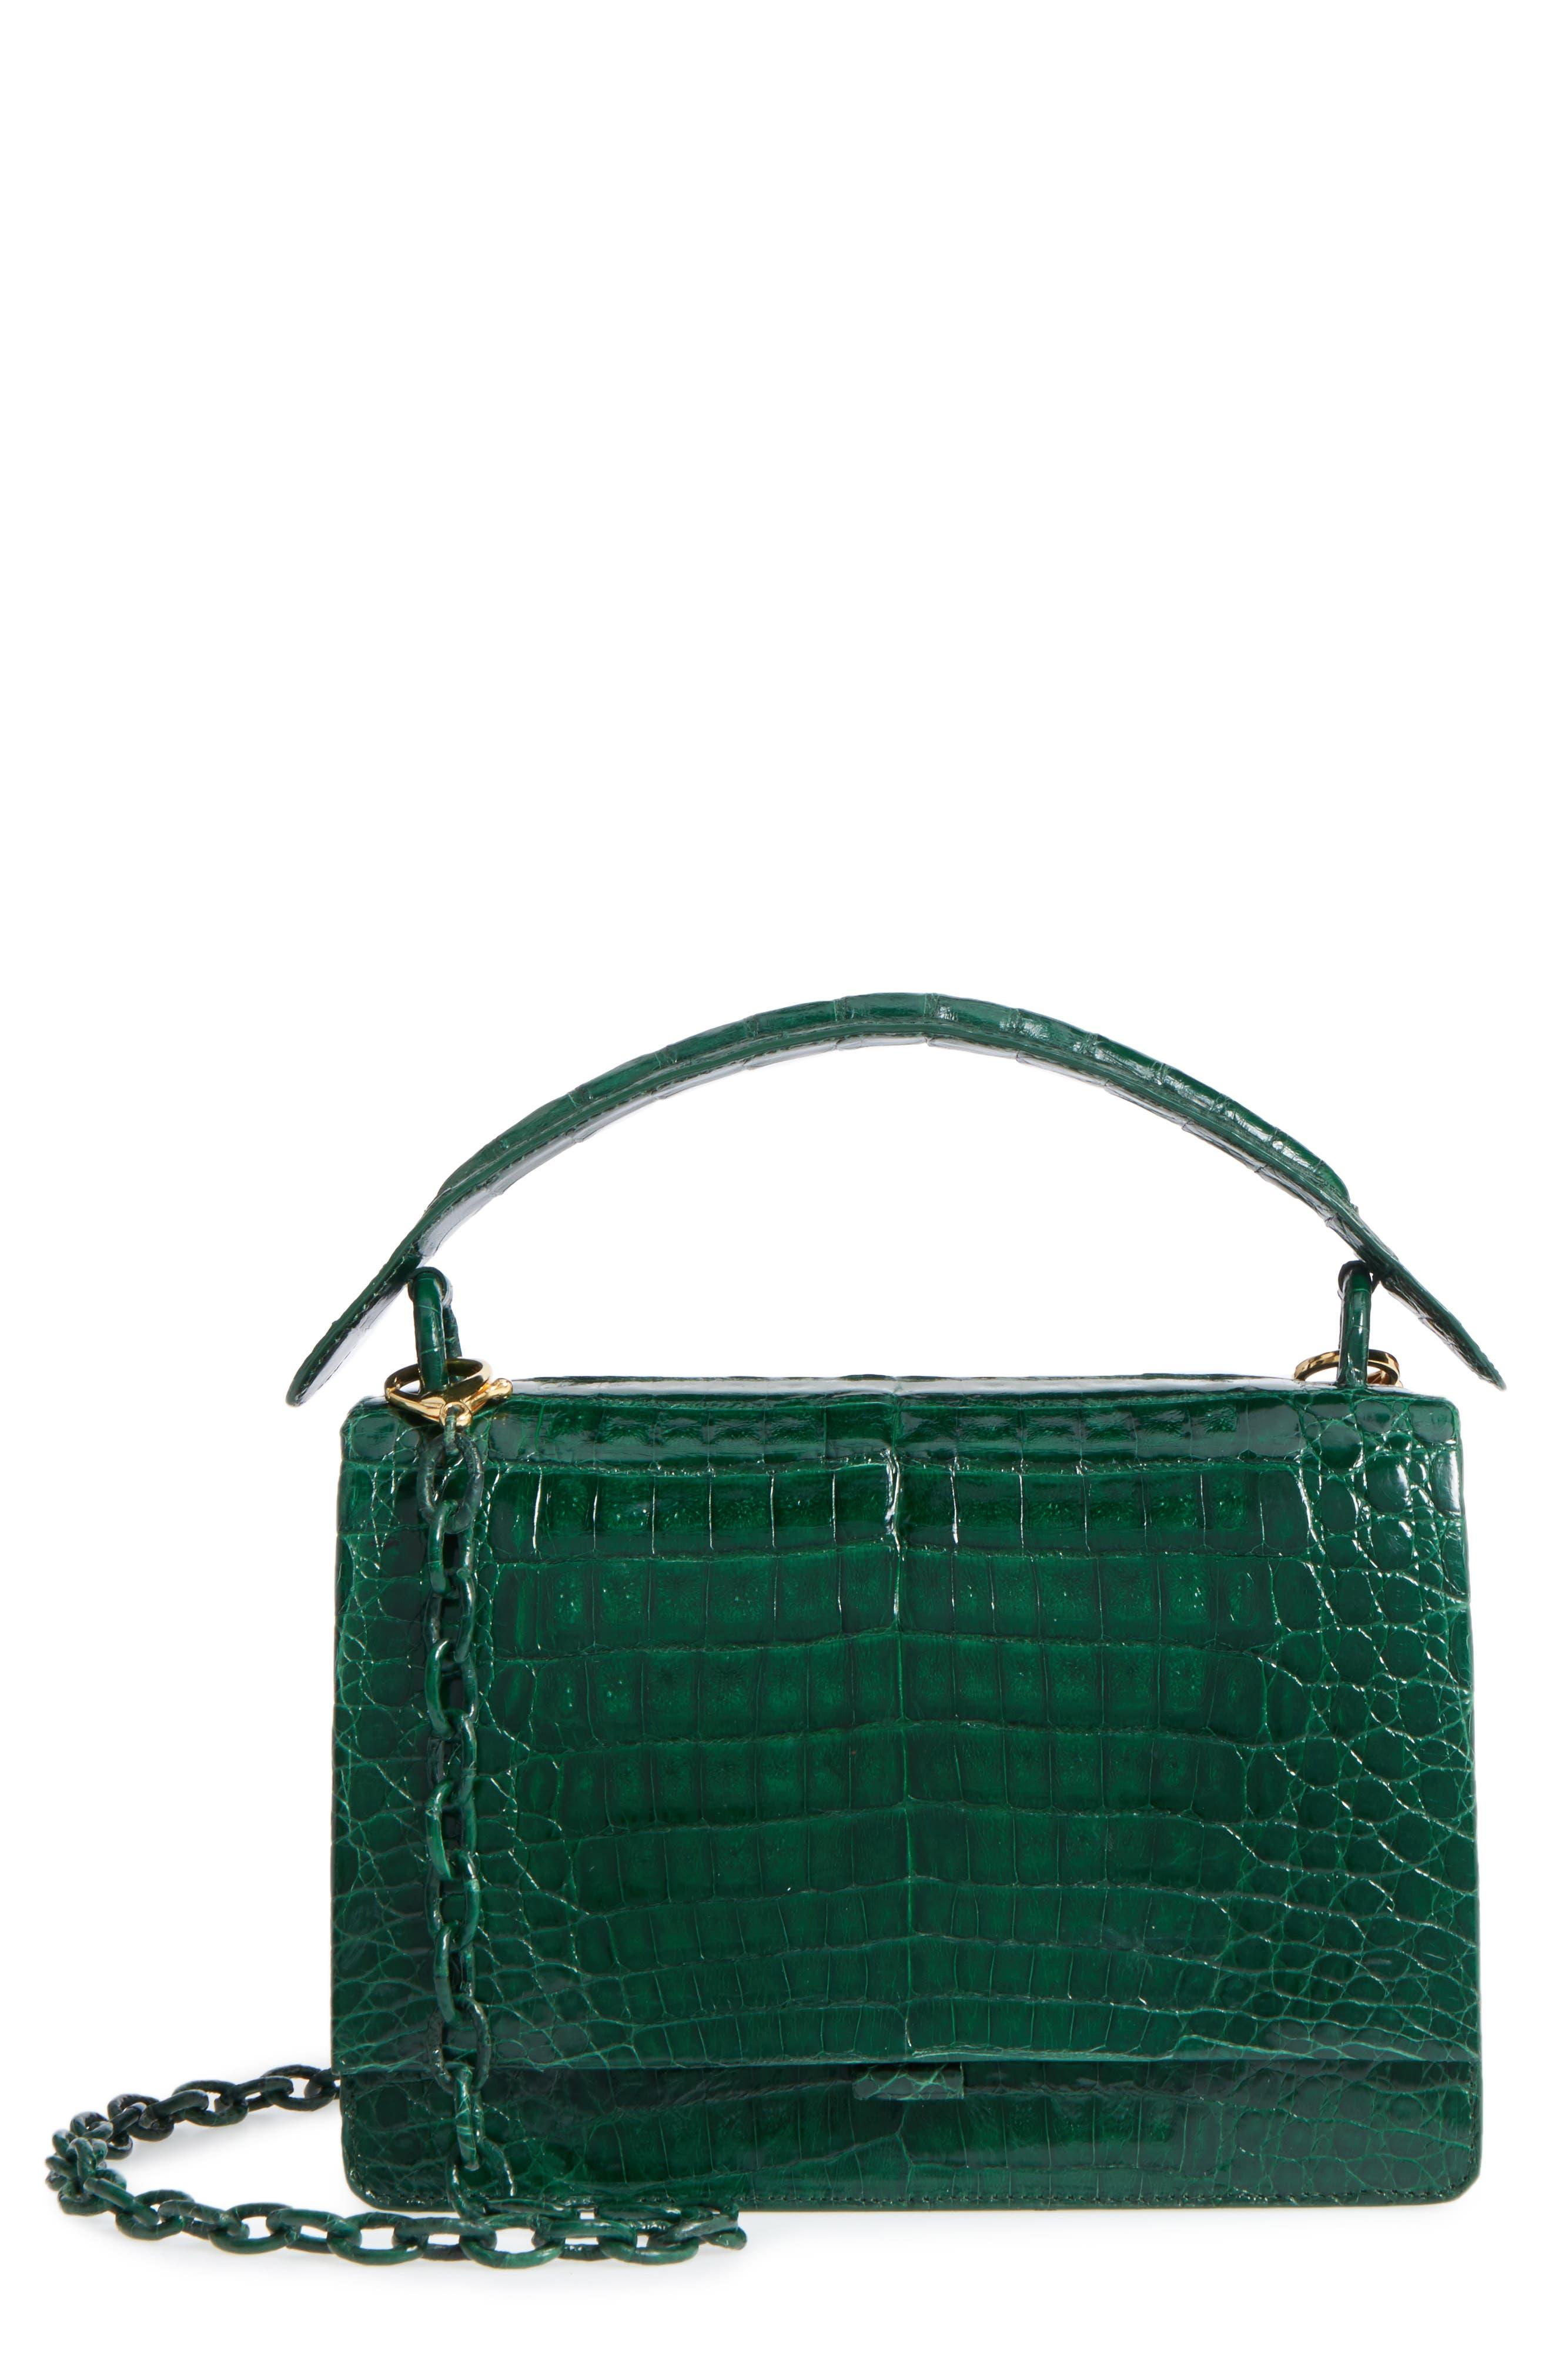 Divino Genuine Crocodile Top Handle Bag,                         Main,                         color, Kelly Green Shiny